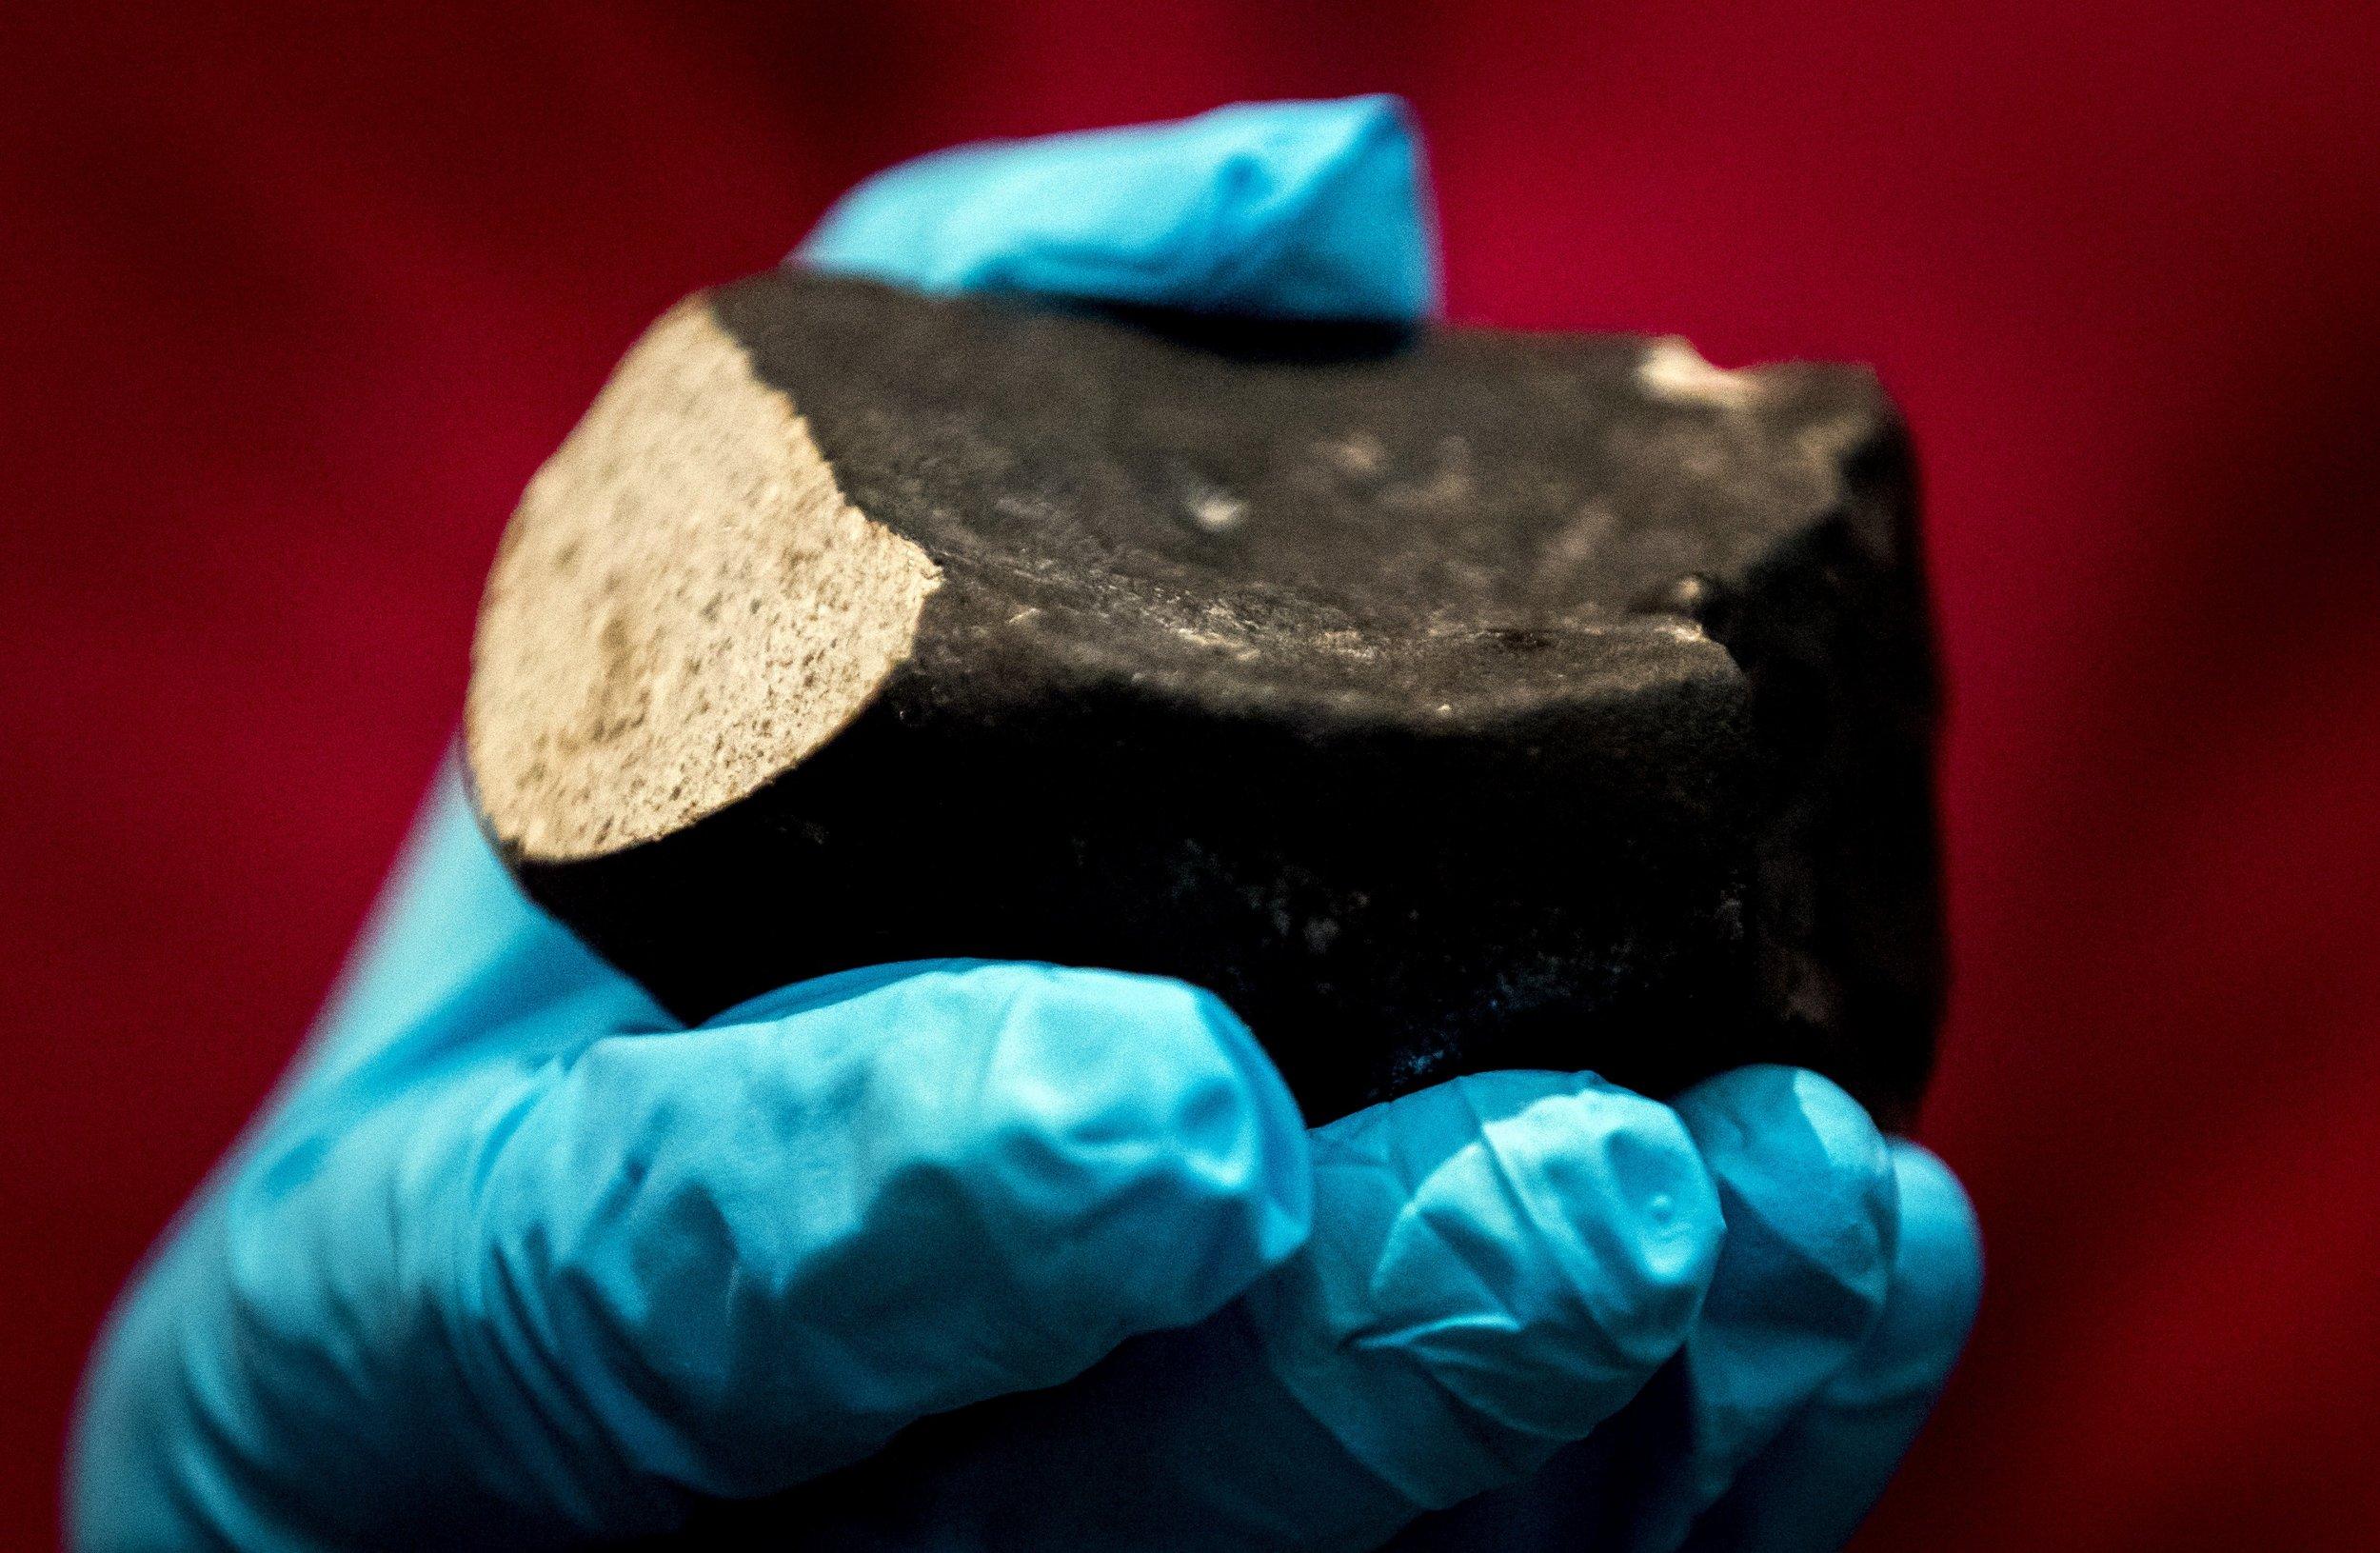 01_05_meteorite_analysis_asteroid